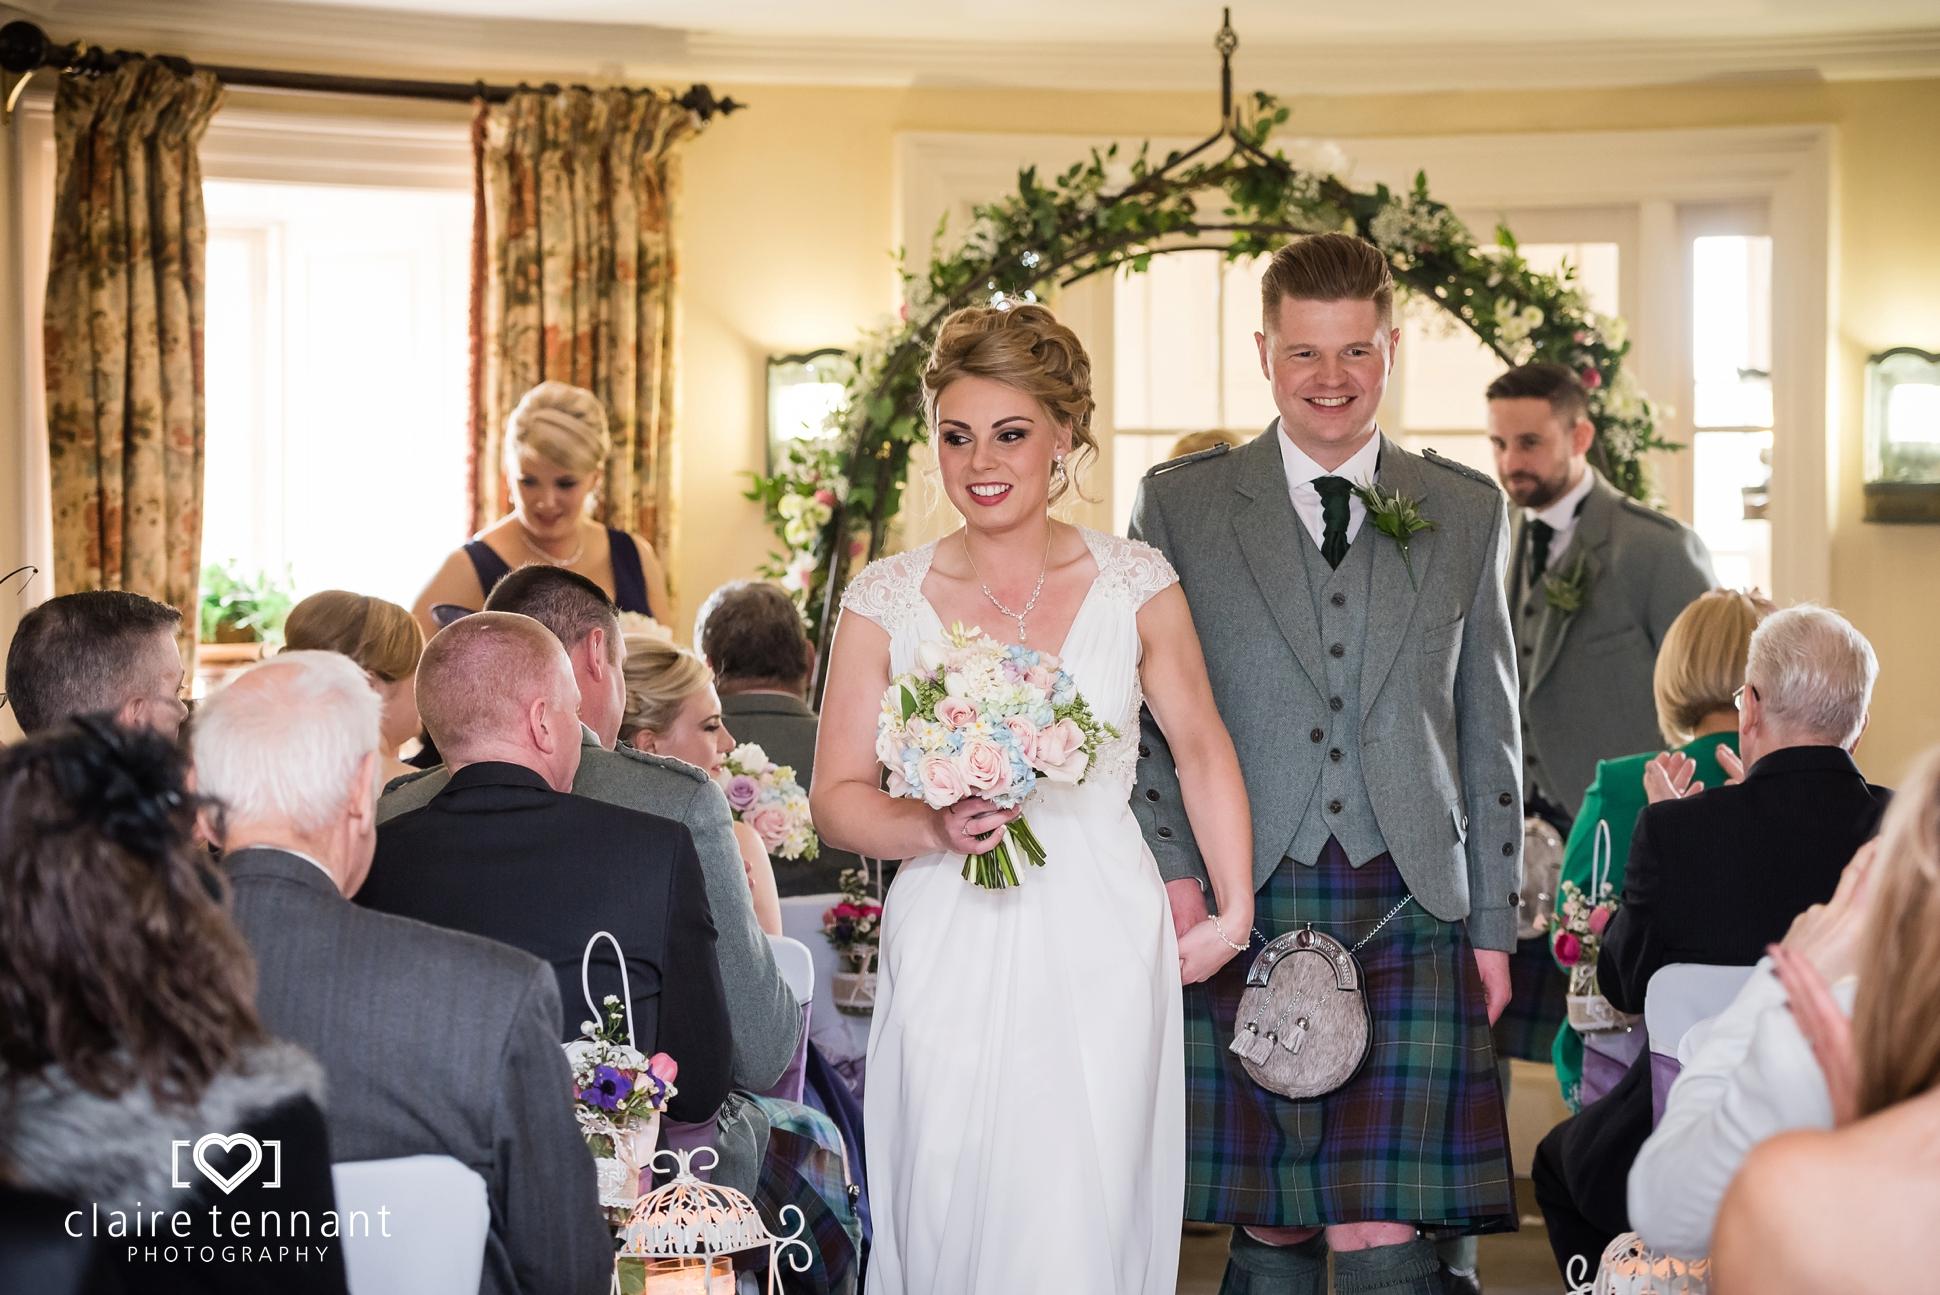 Archerfield Mansion House wedding ceremony